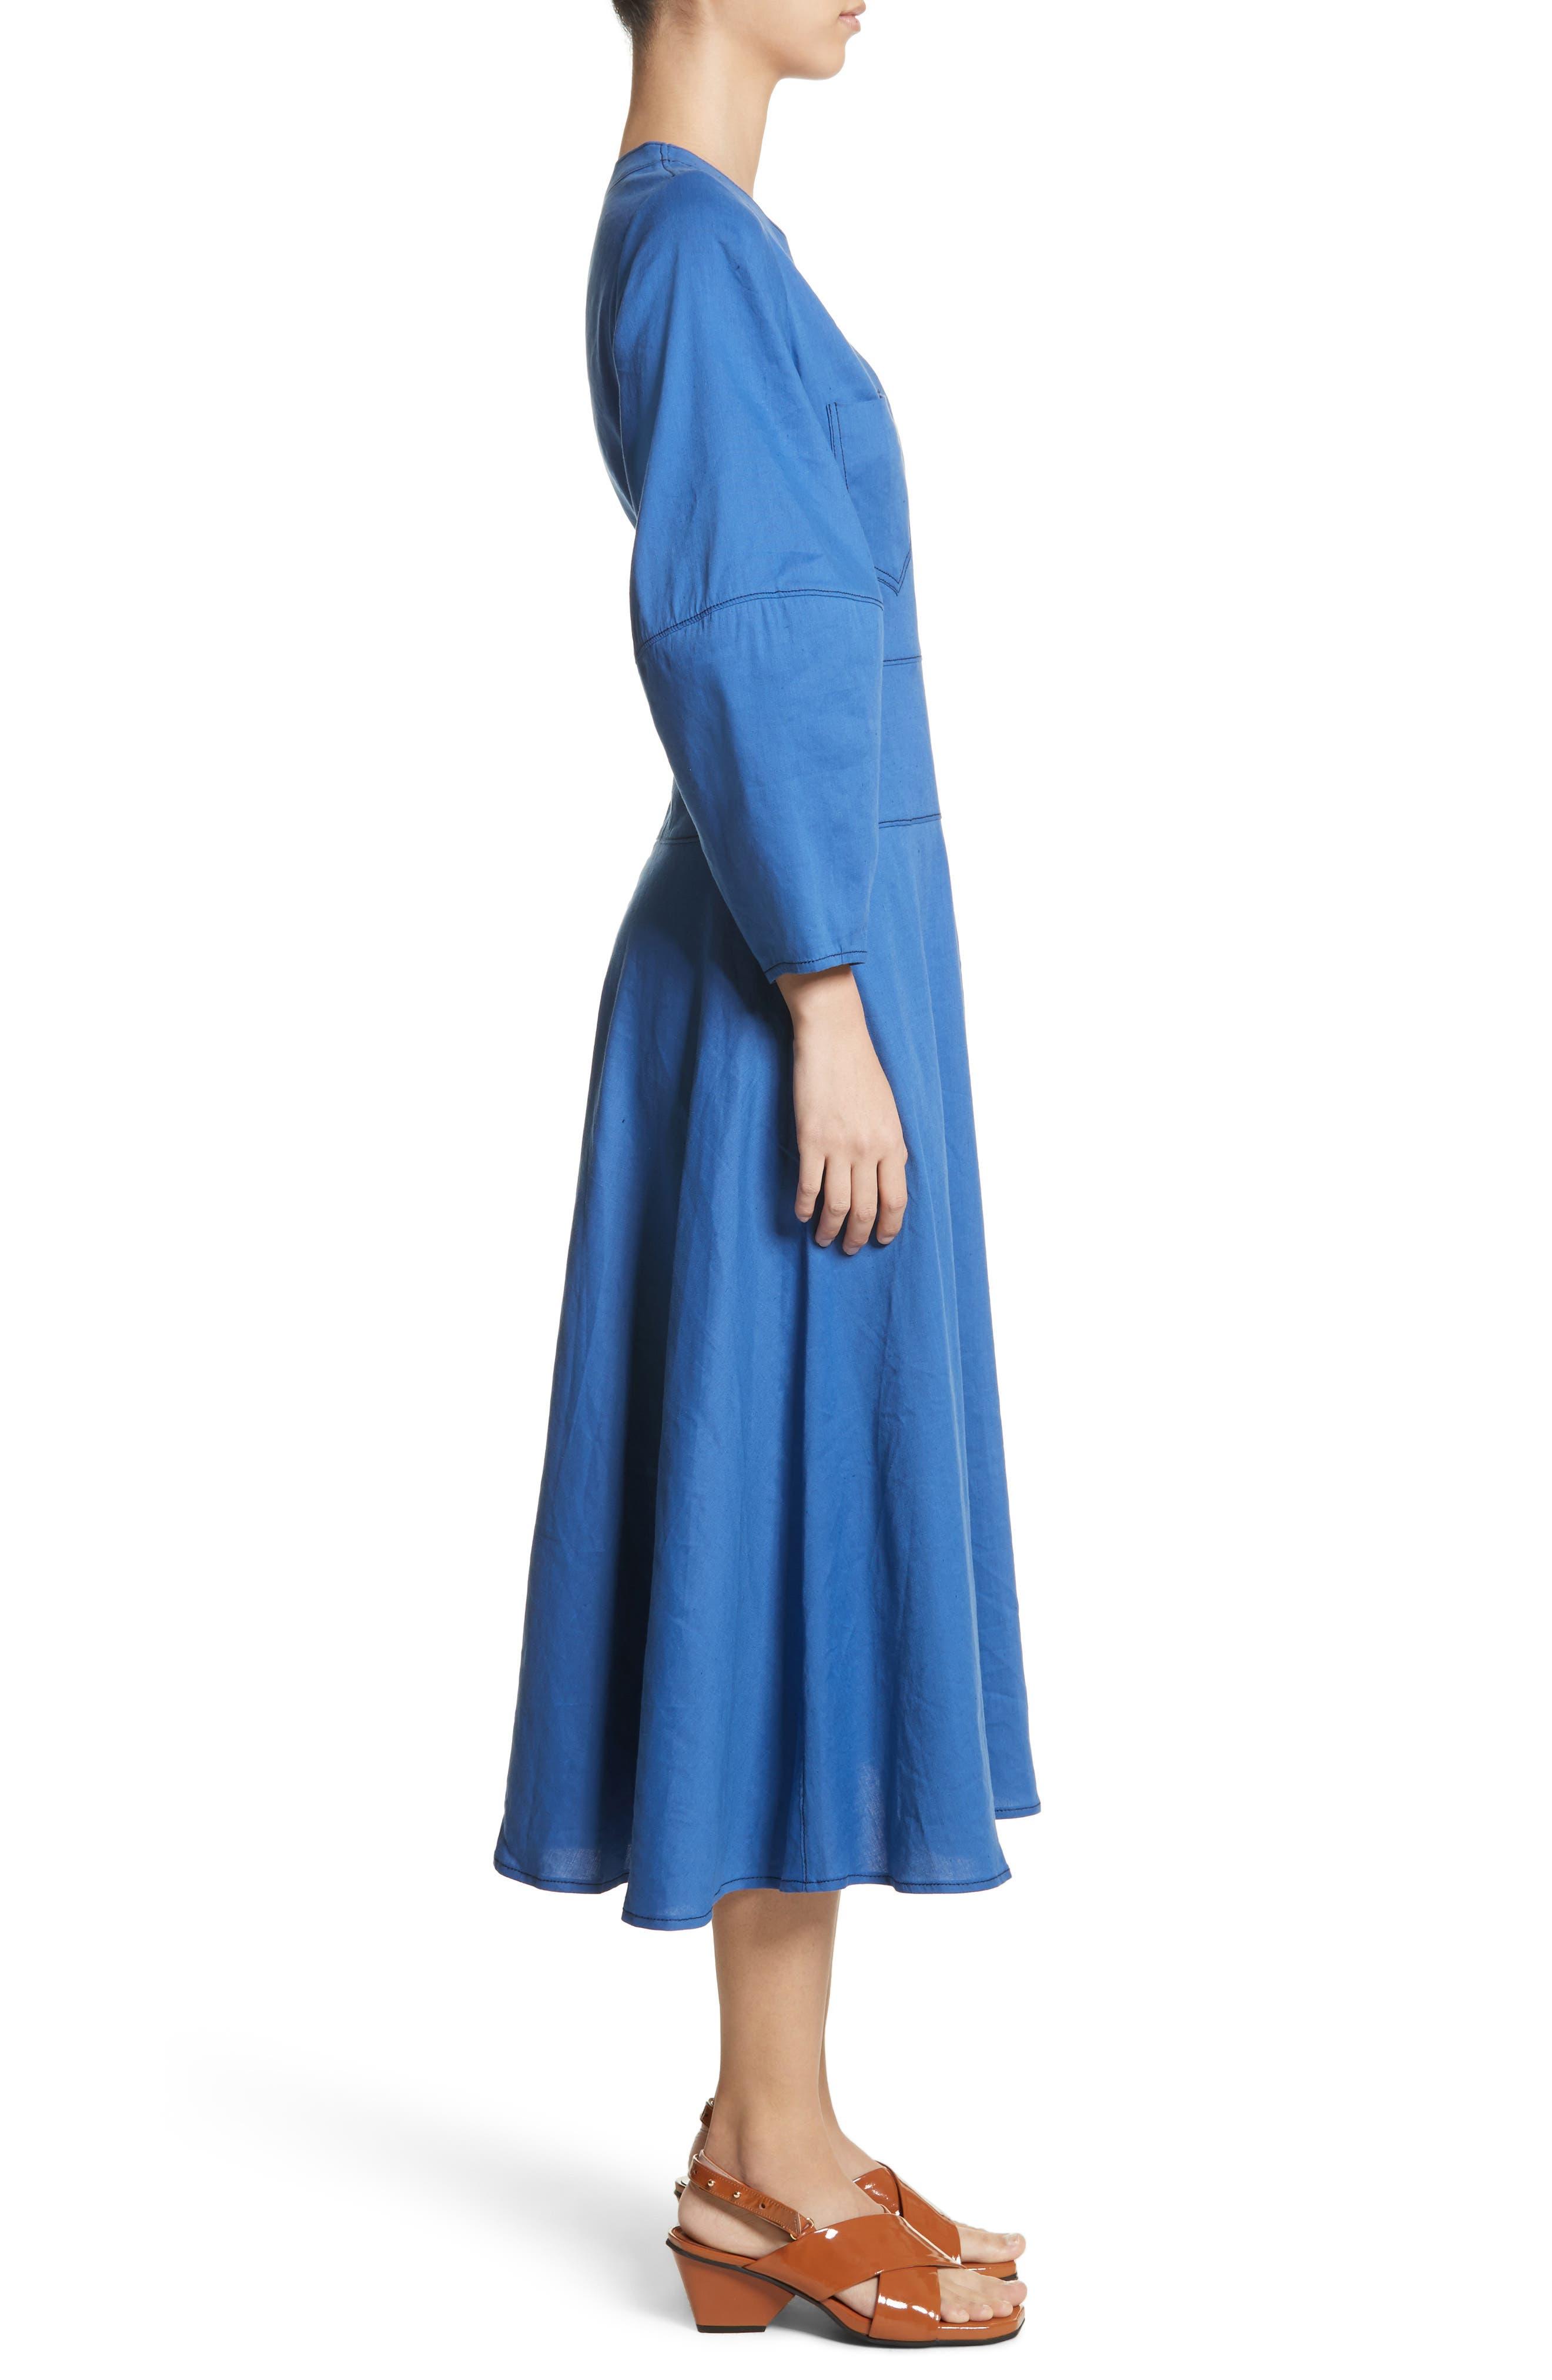 Michaela Linen Dress,                             Alternate thumbnail 3, color,                             Linen Blue